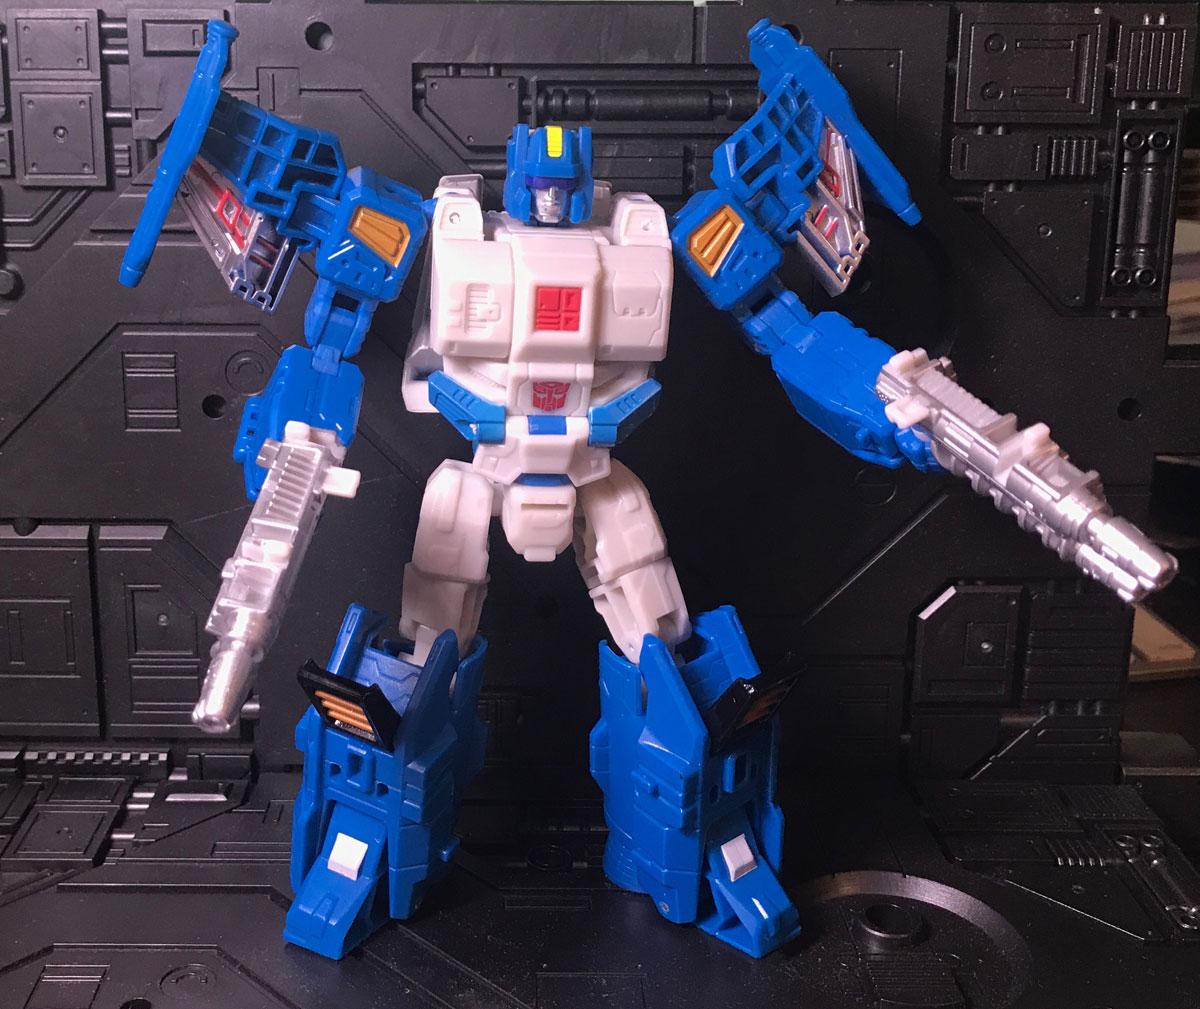 Topspin robot mode